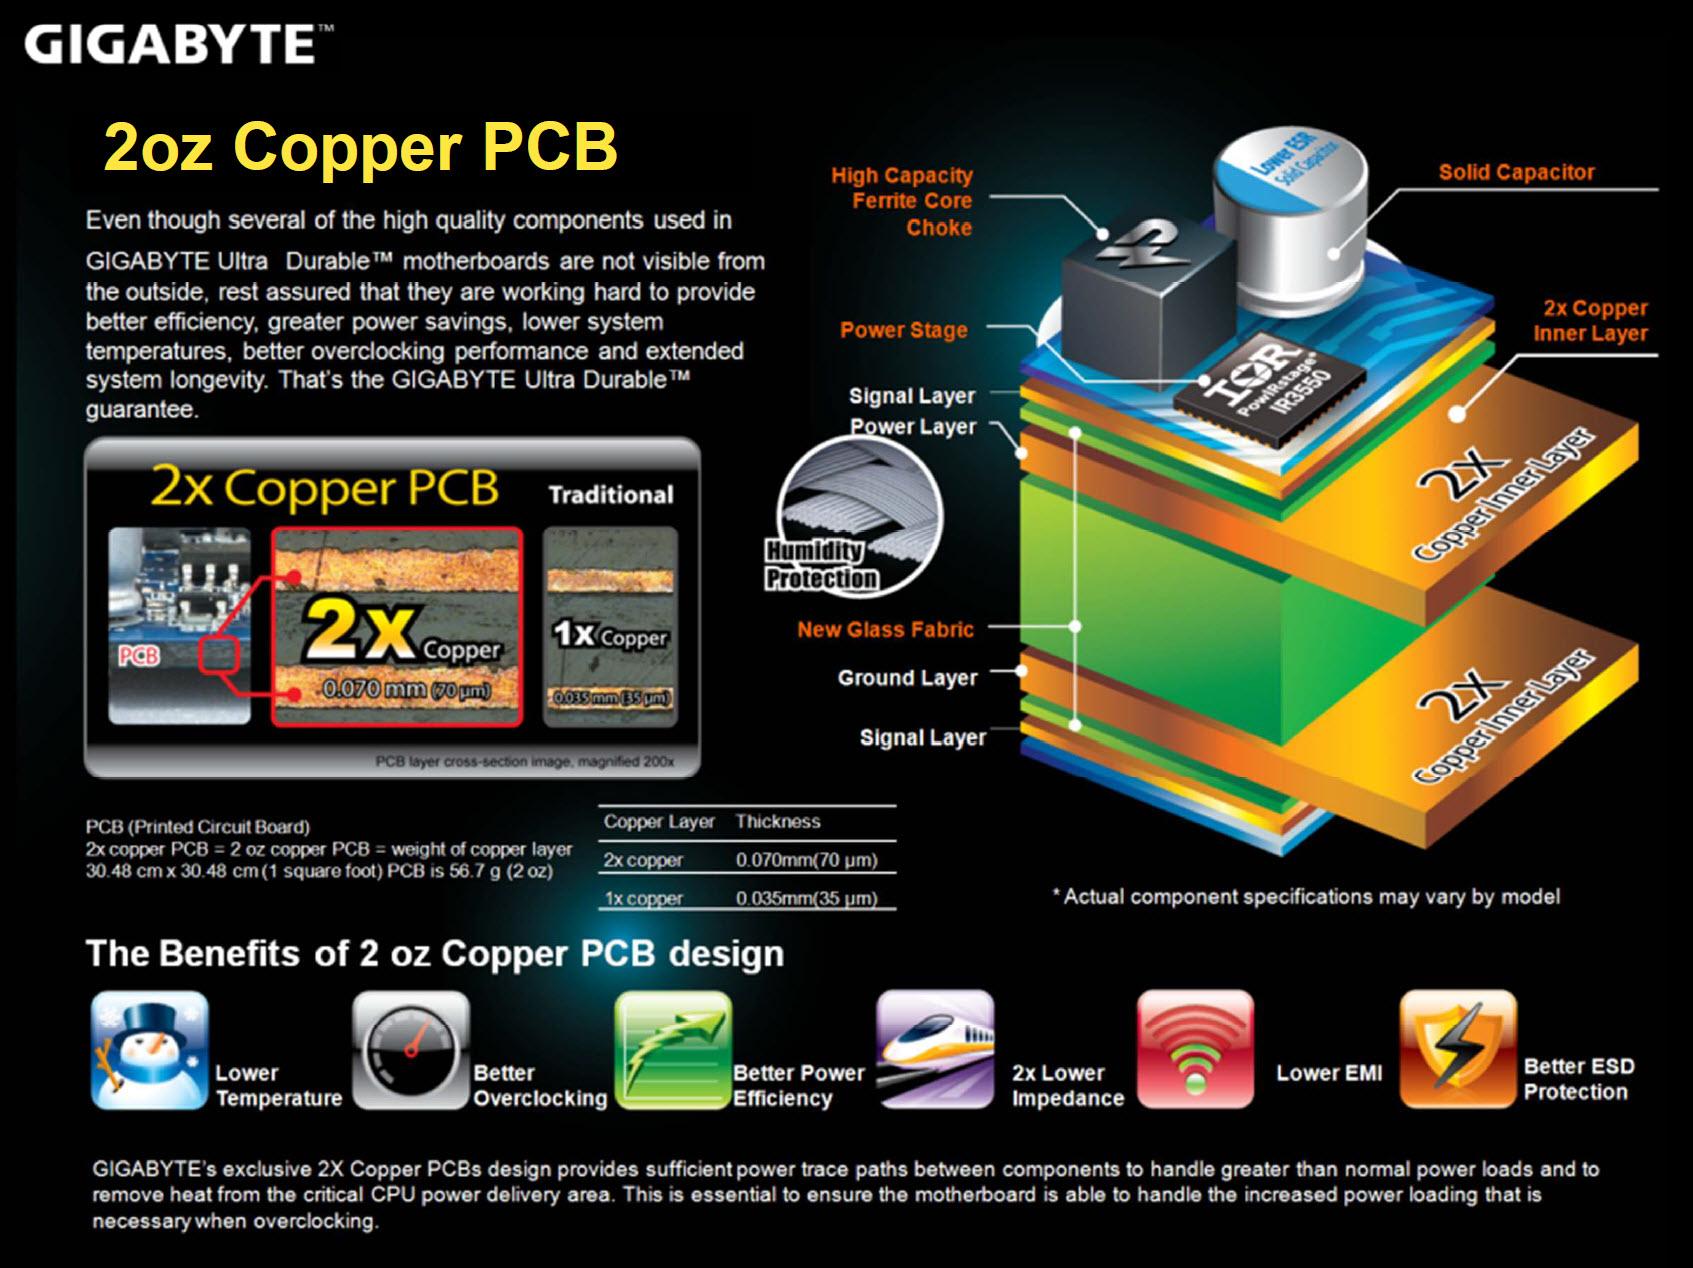 gigabyte-x99-ud7-wifi_copper-pcb